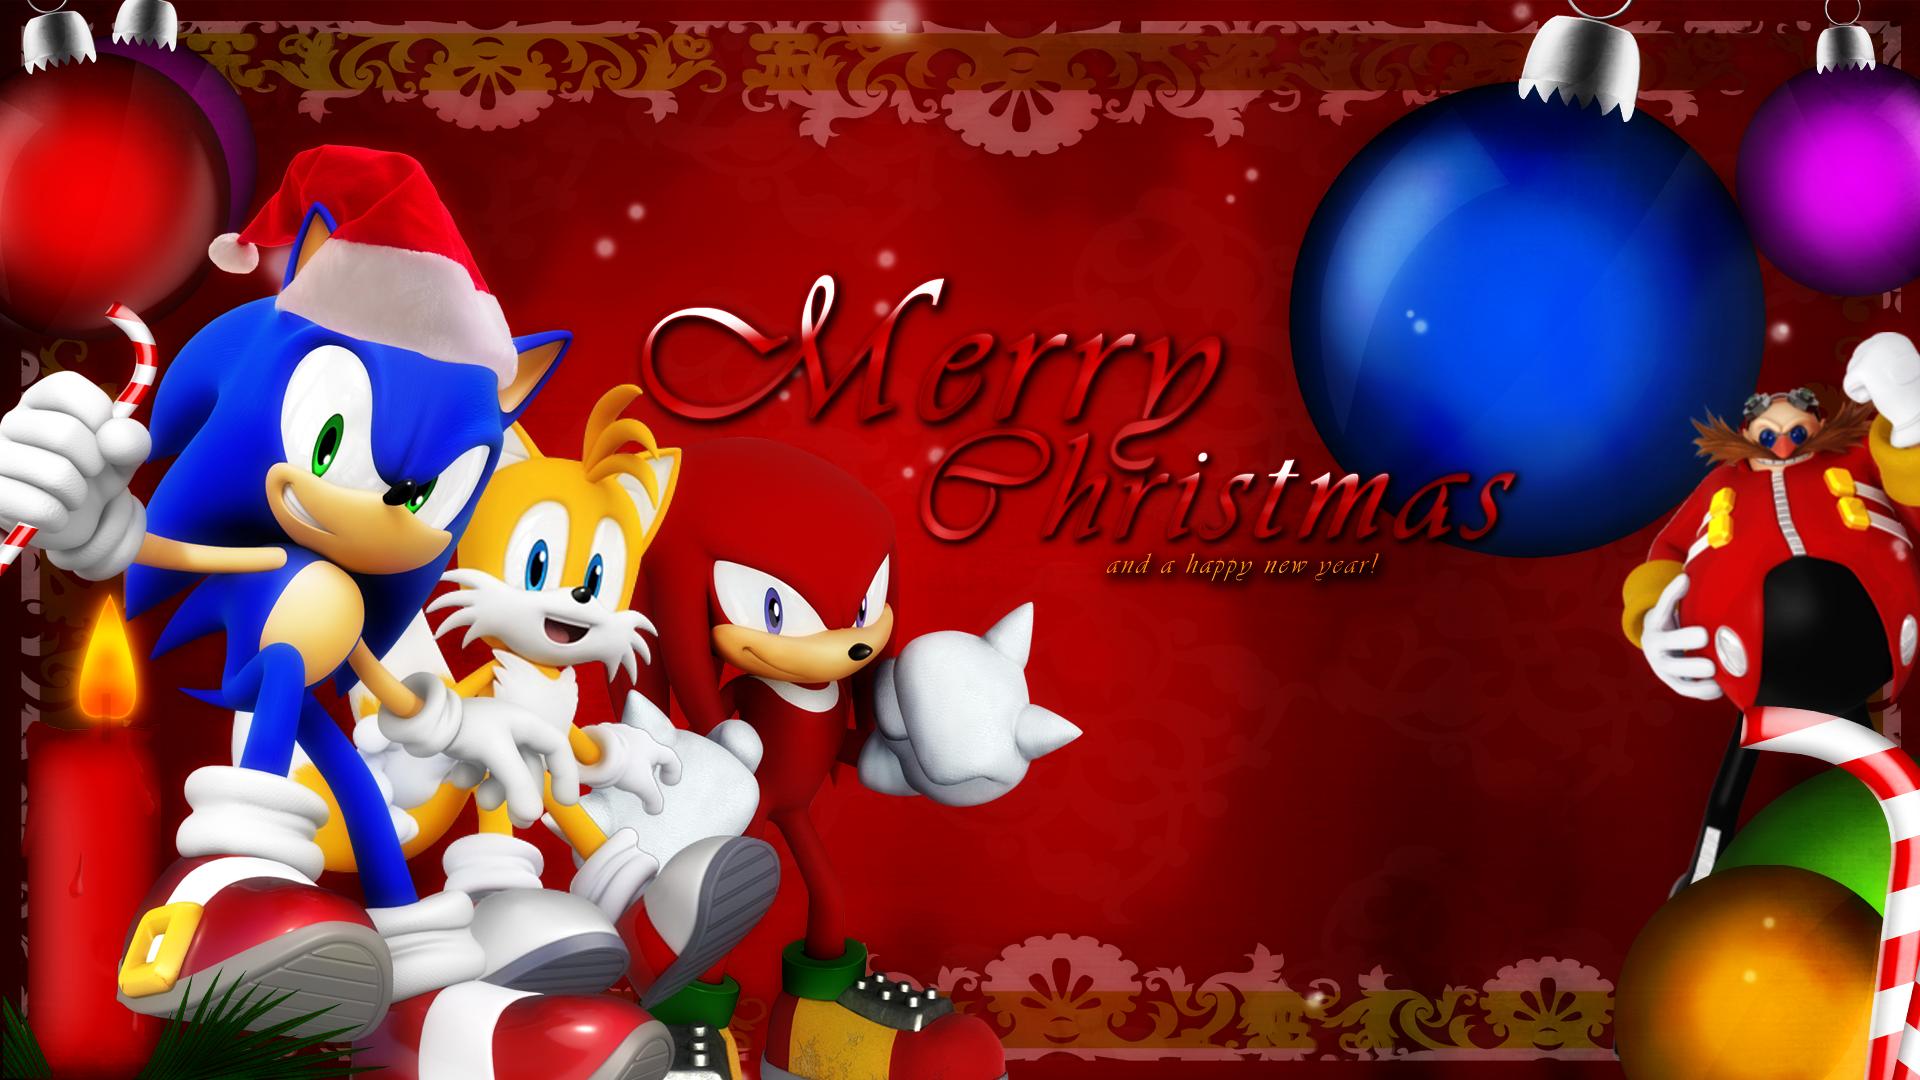 Sonic Christmas Wallpaper by darkfailure on DeviantArt